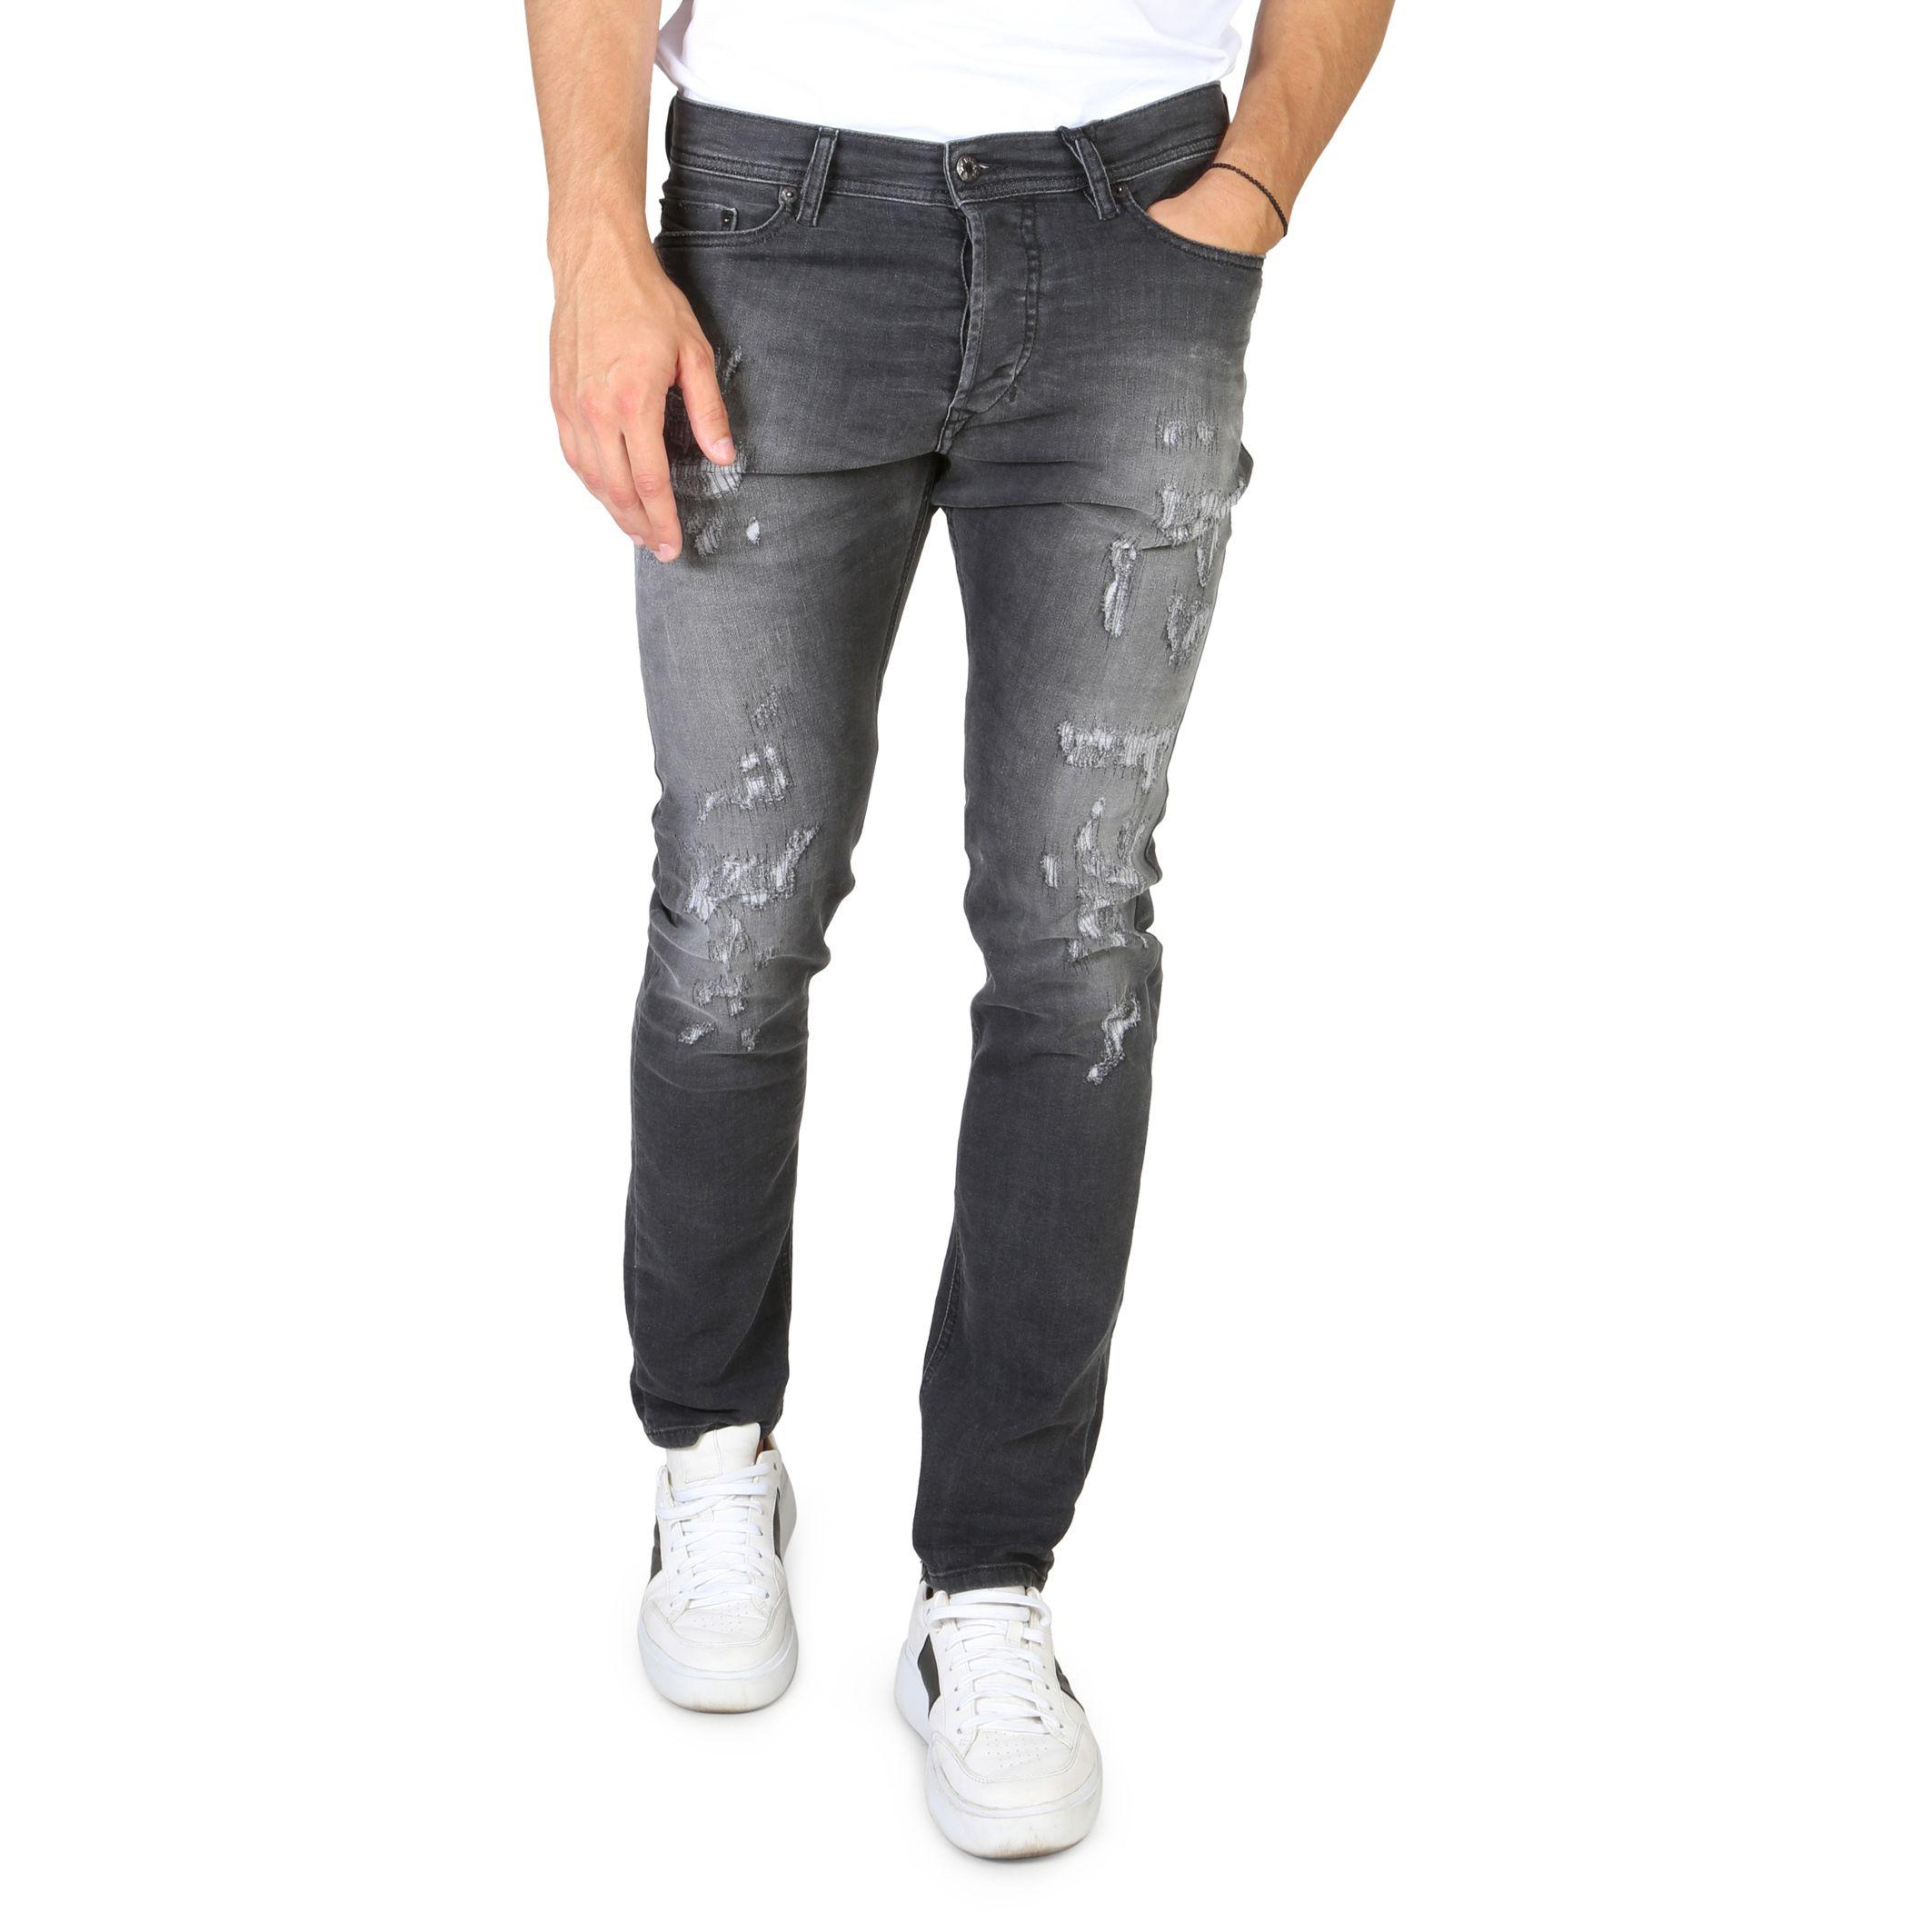 Diesel – TEPPHAR Leg L32 Jeans